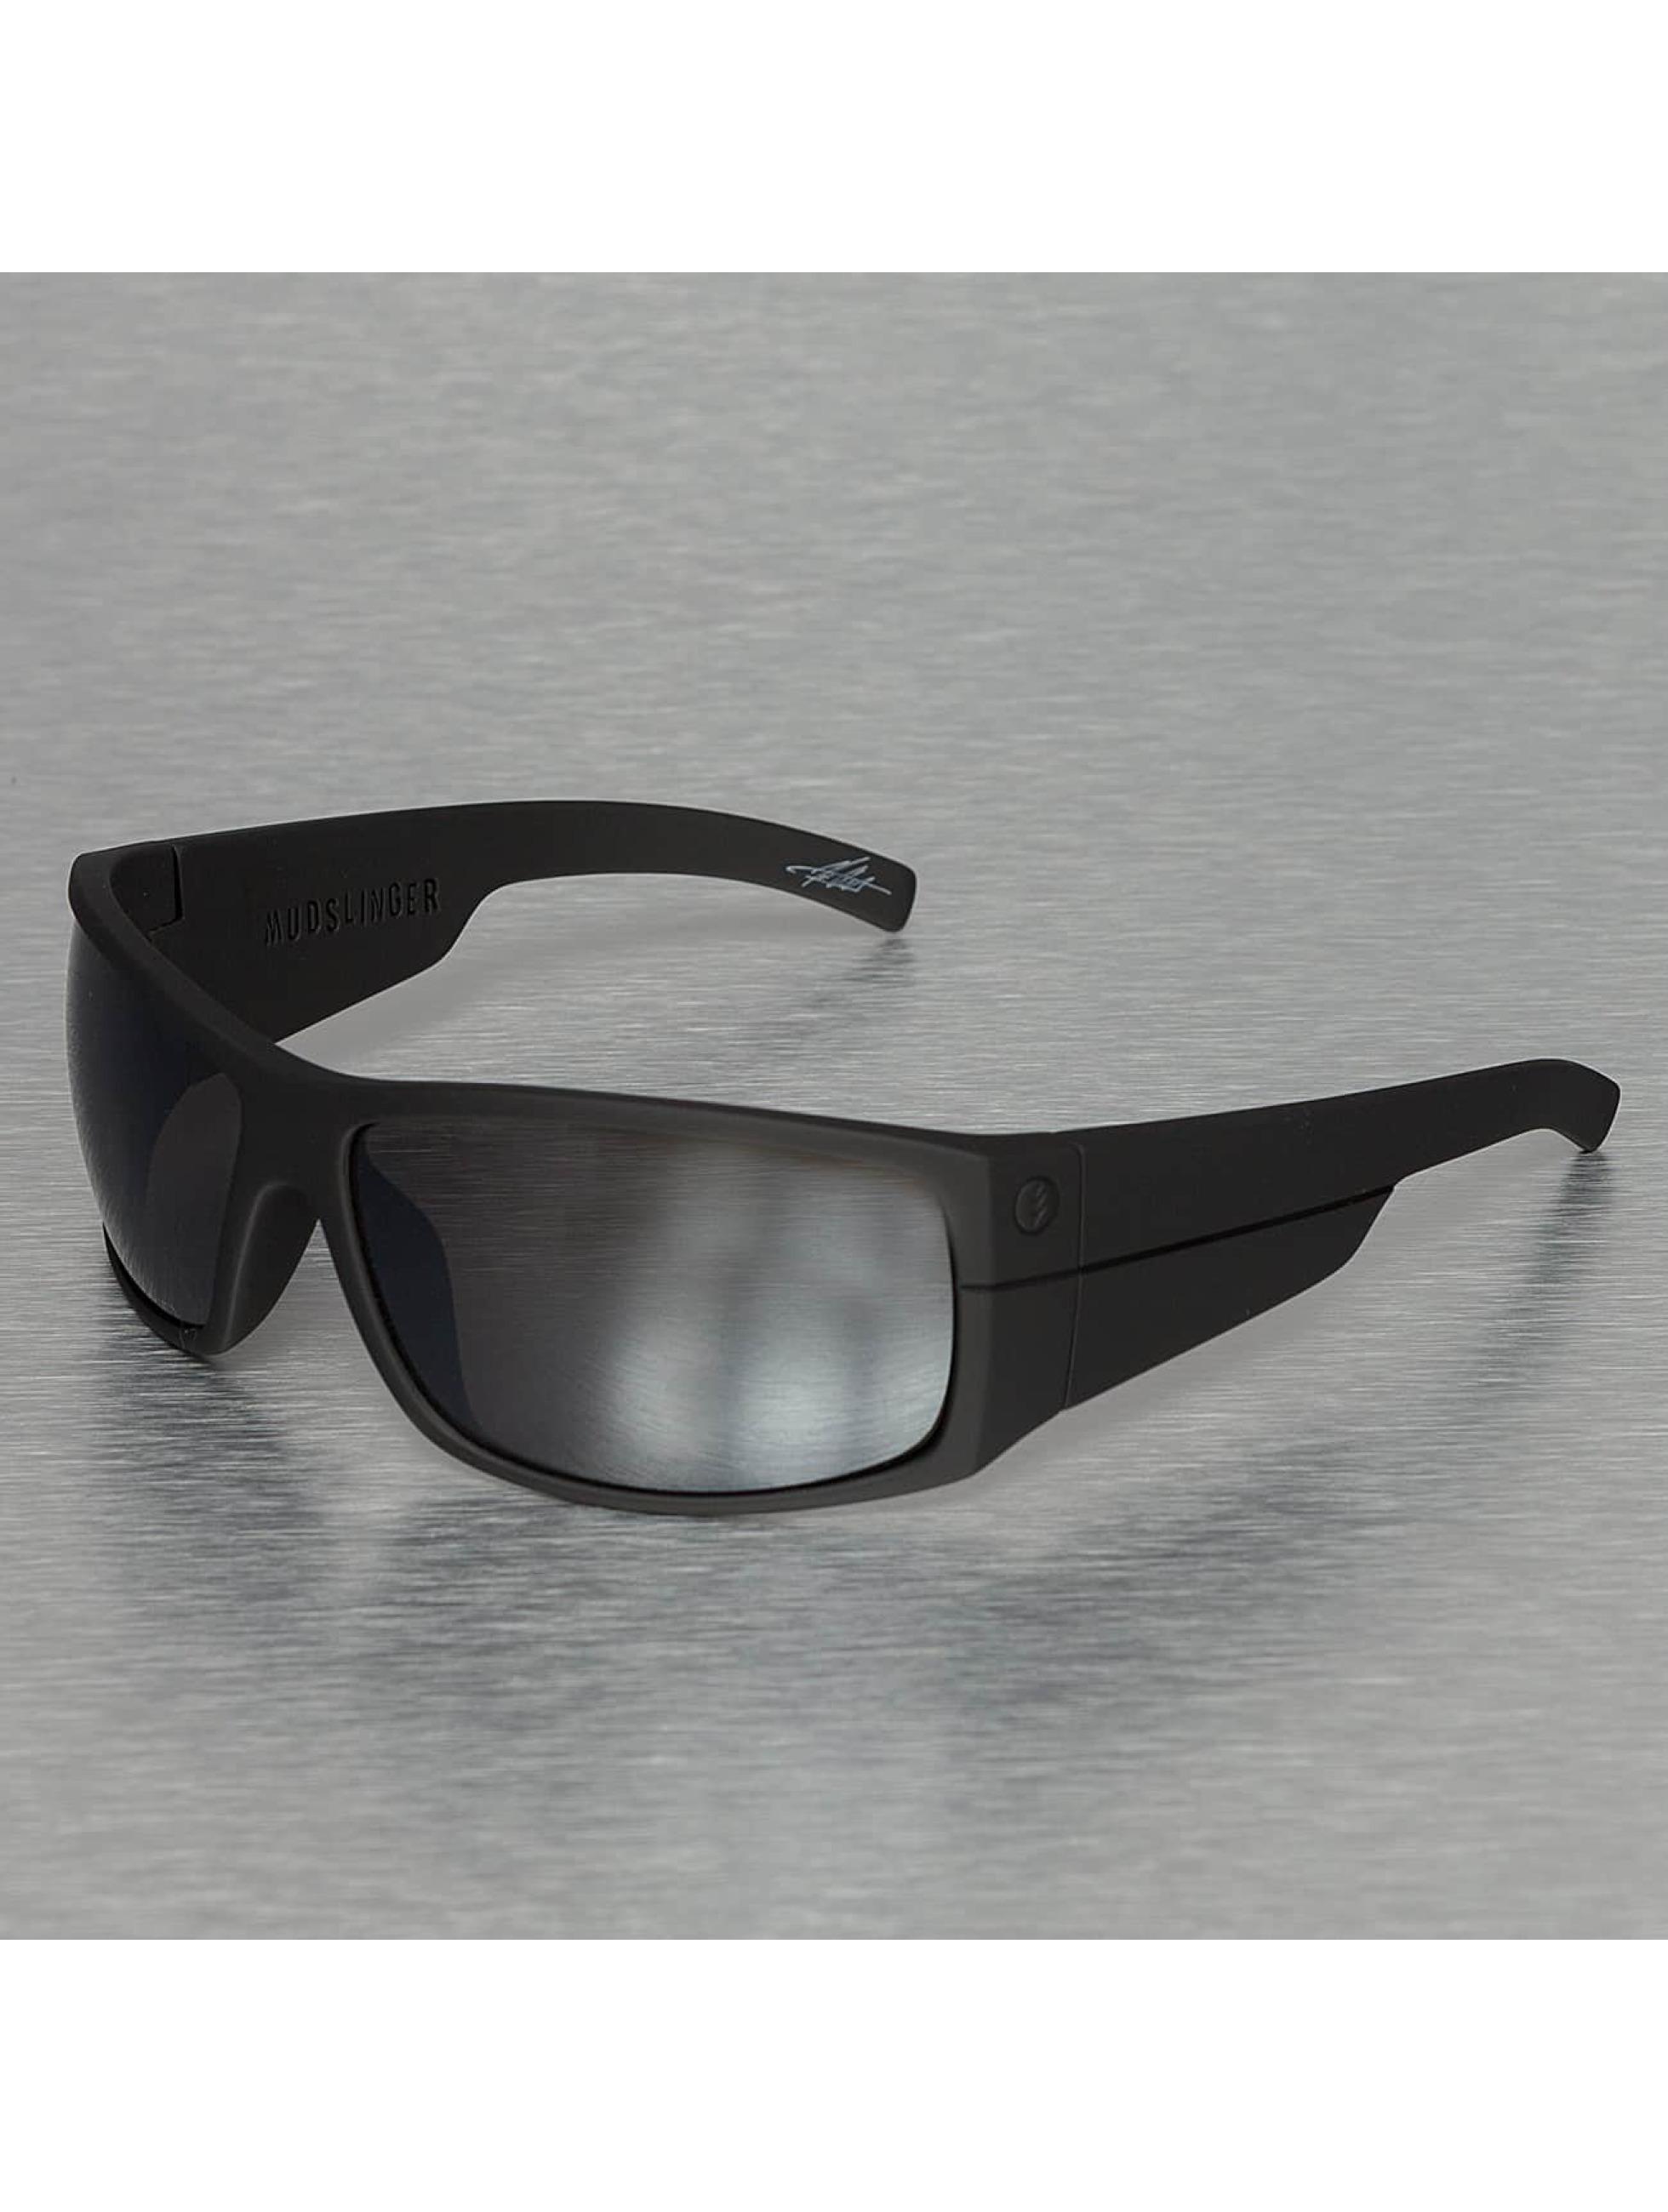 Electric Sunglasses MUDSLINGER gray